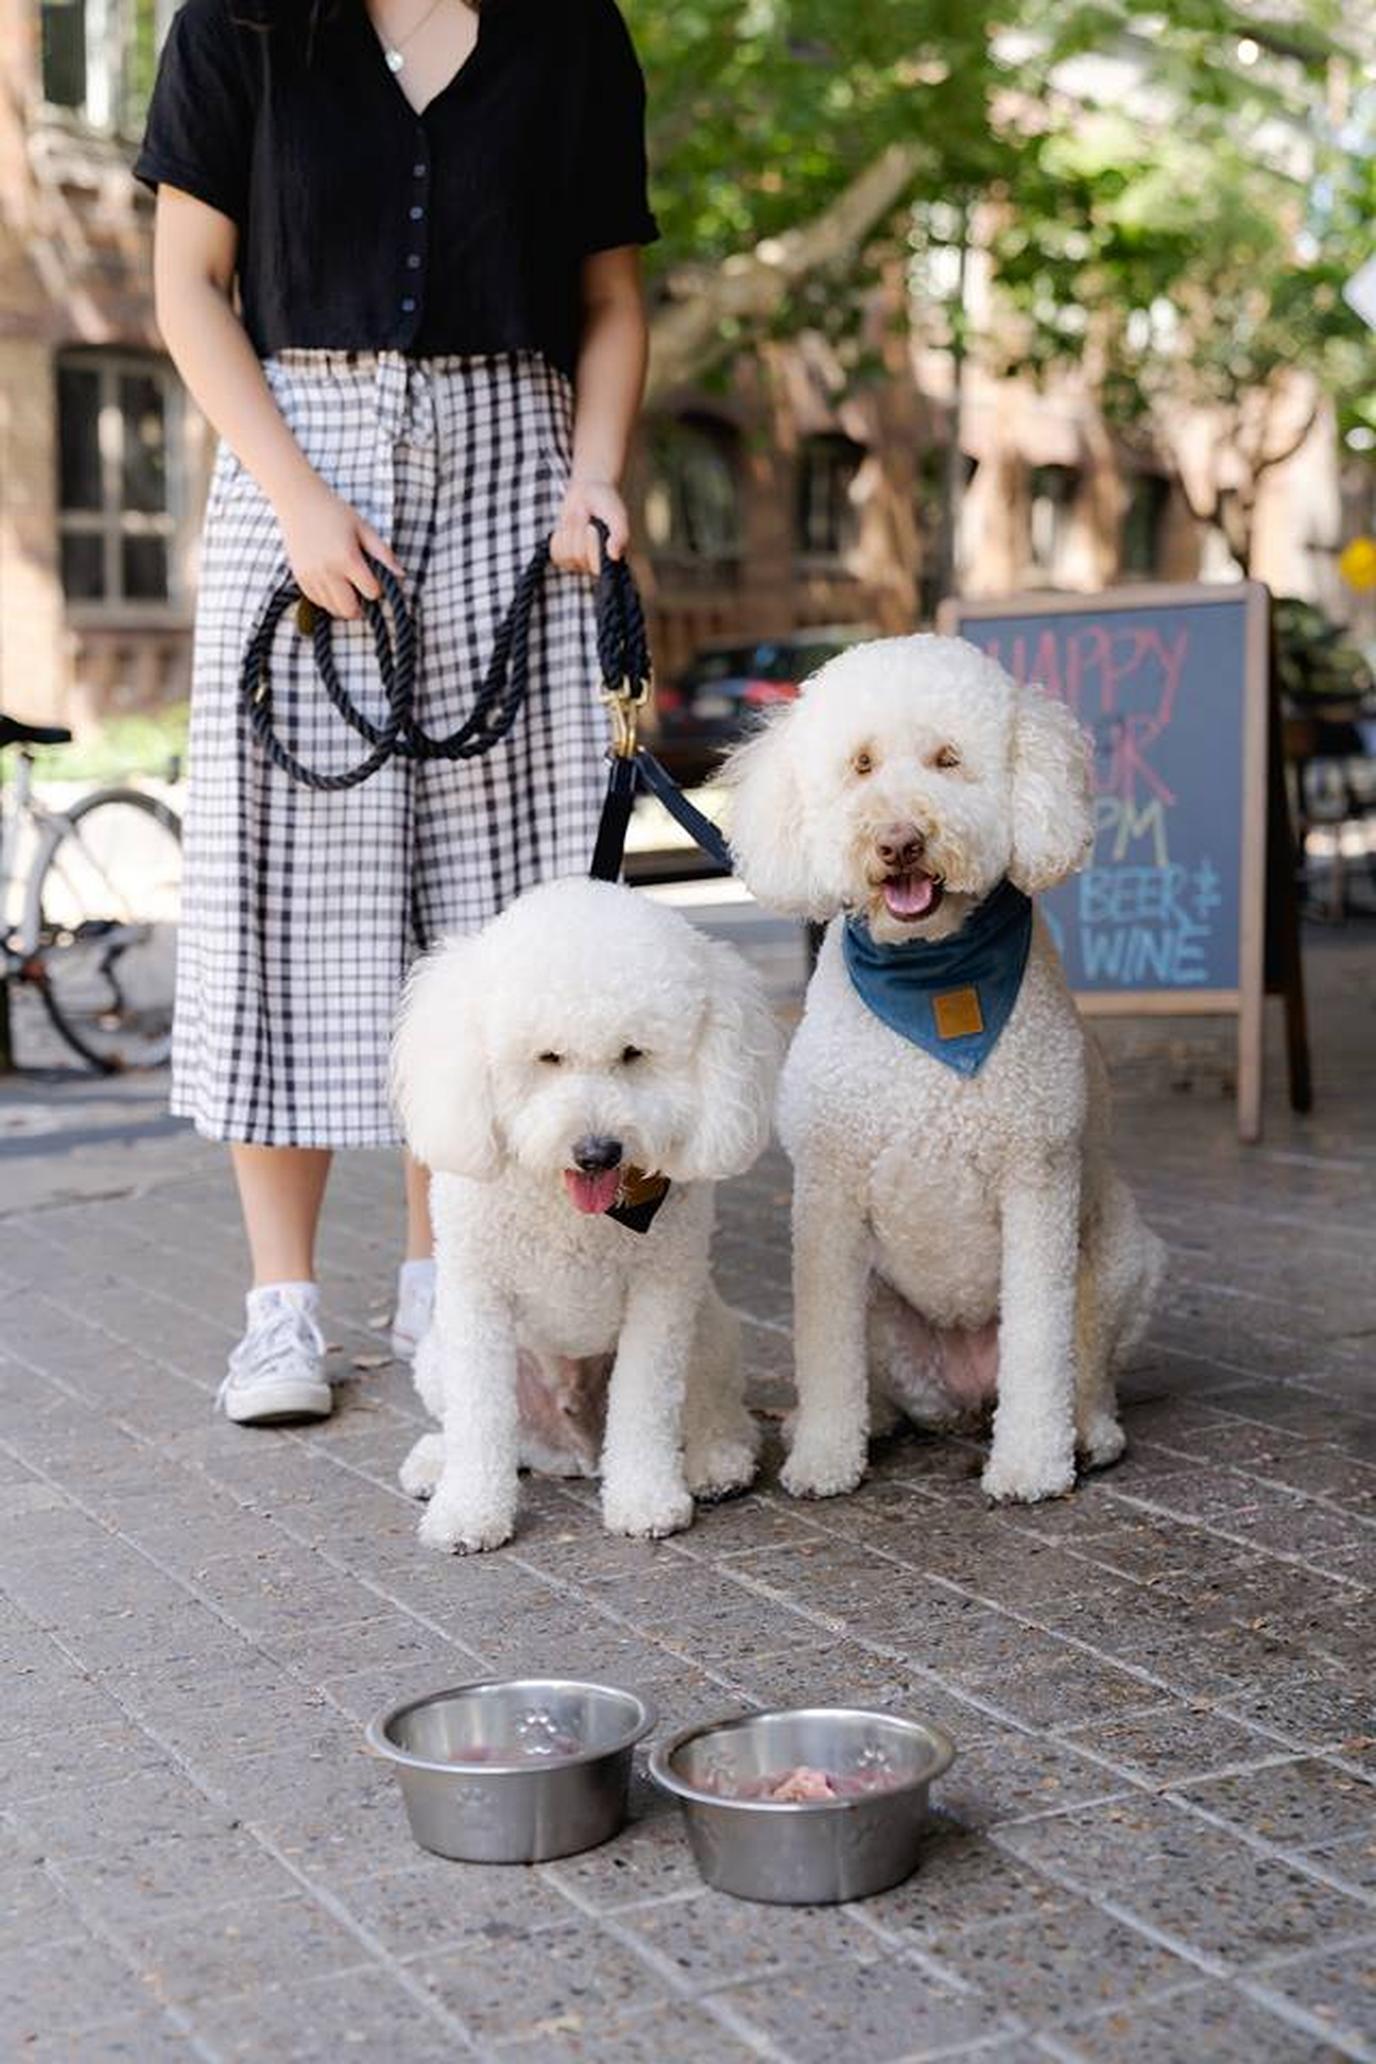 The Carrington's dog menu includes beef tartare, a pup fave.